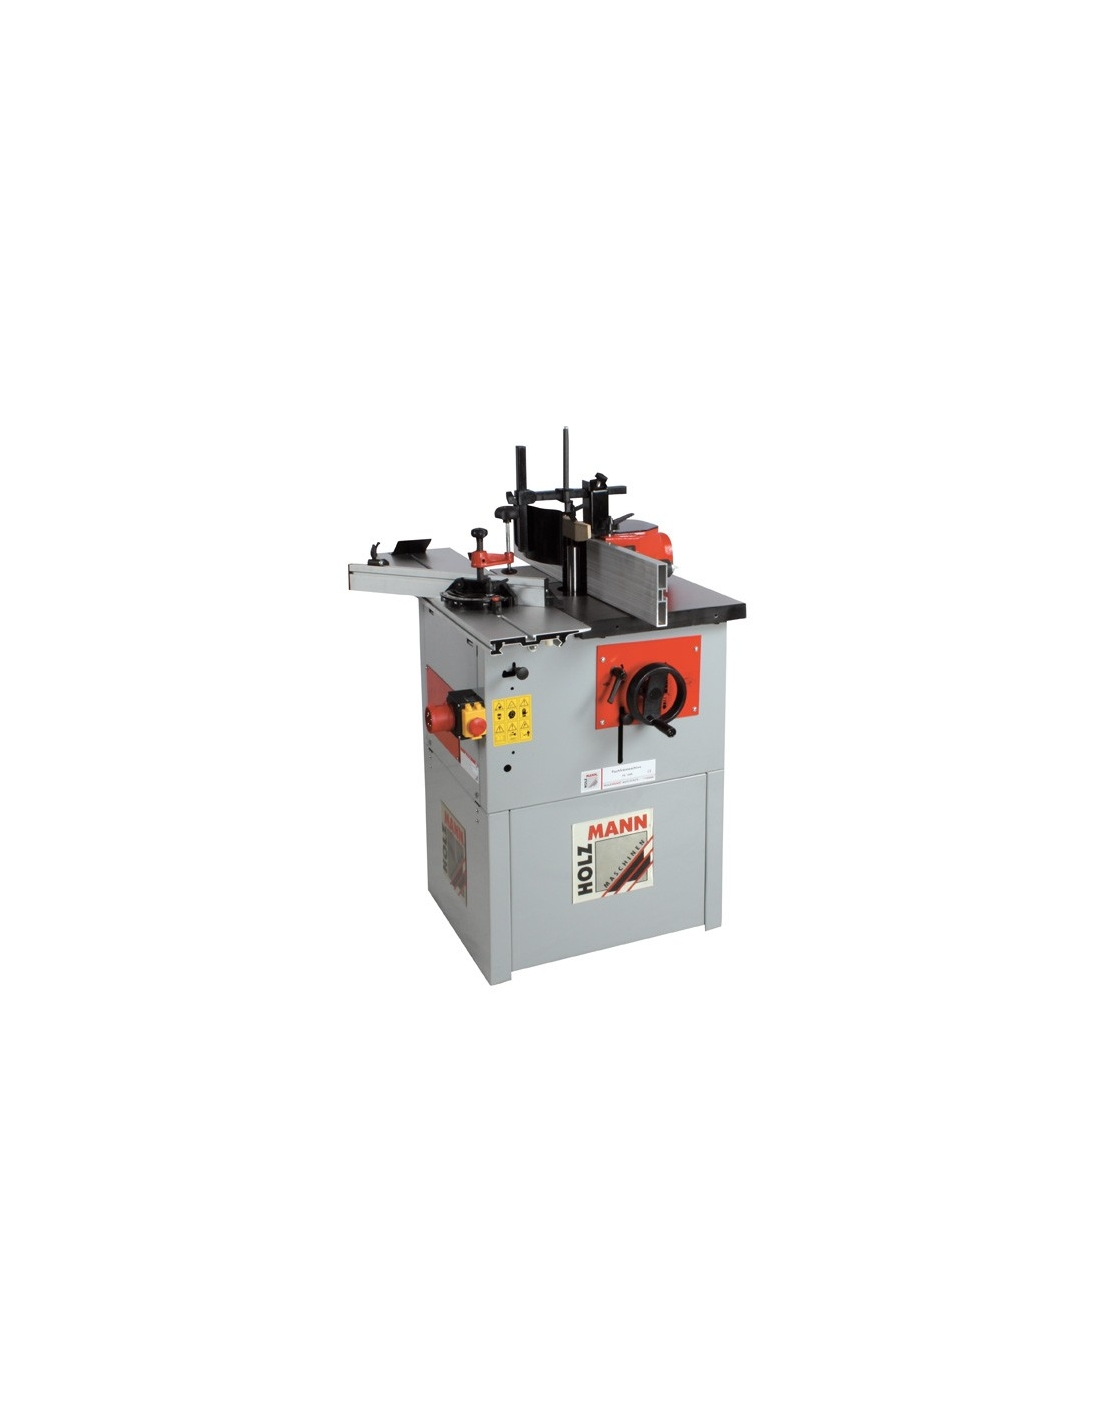 Masina pentru frezat cu masa de formatizat Holzmann FS 160L - 230 V